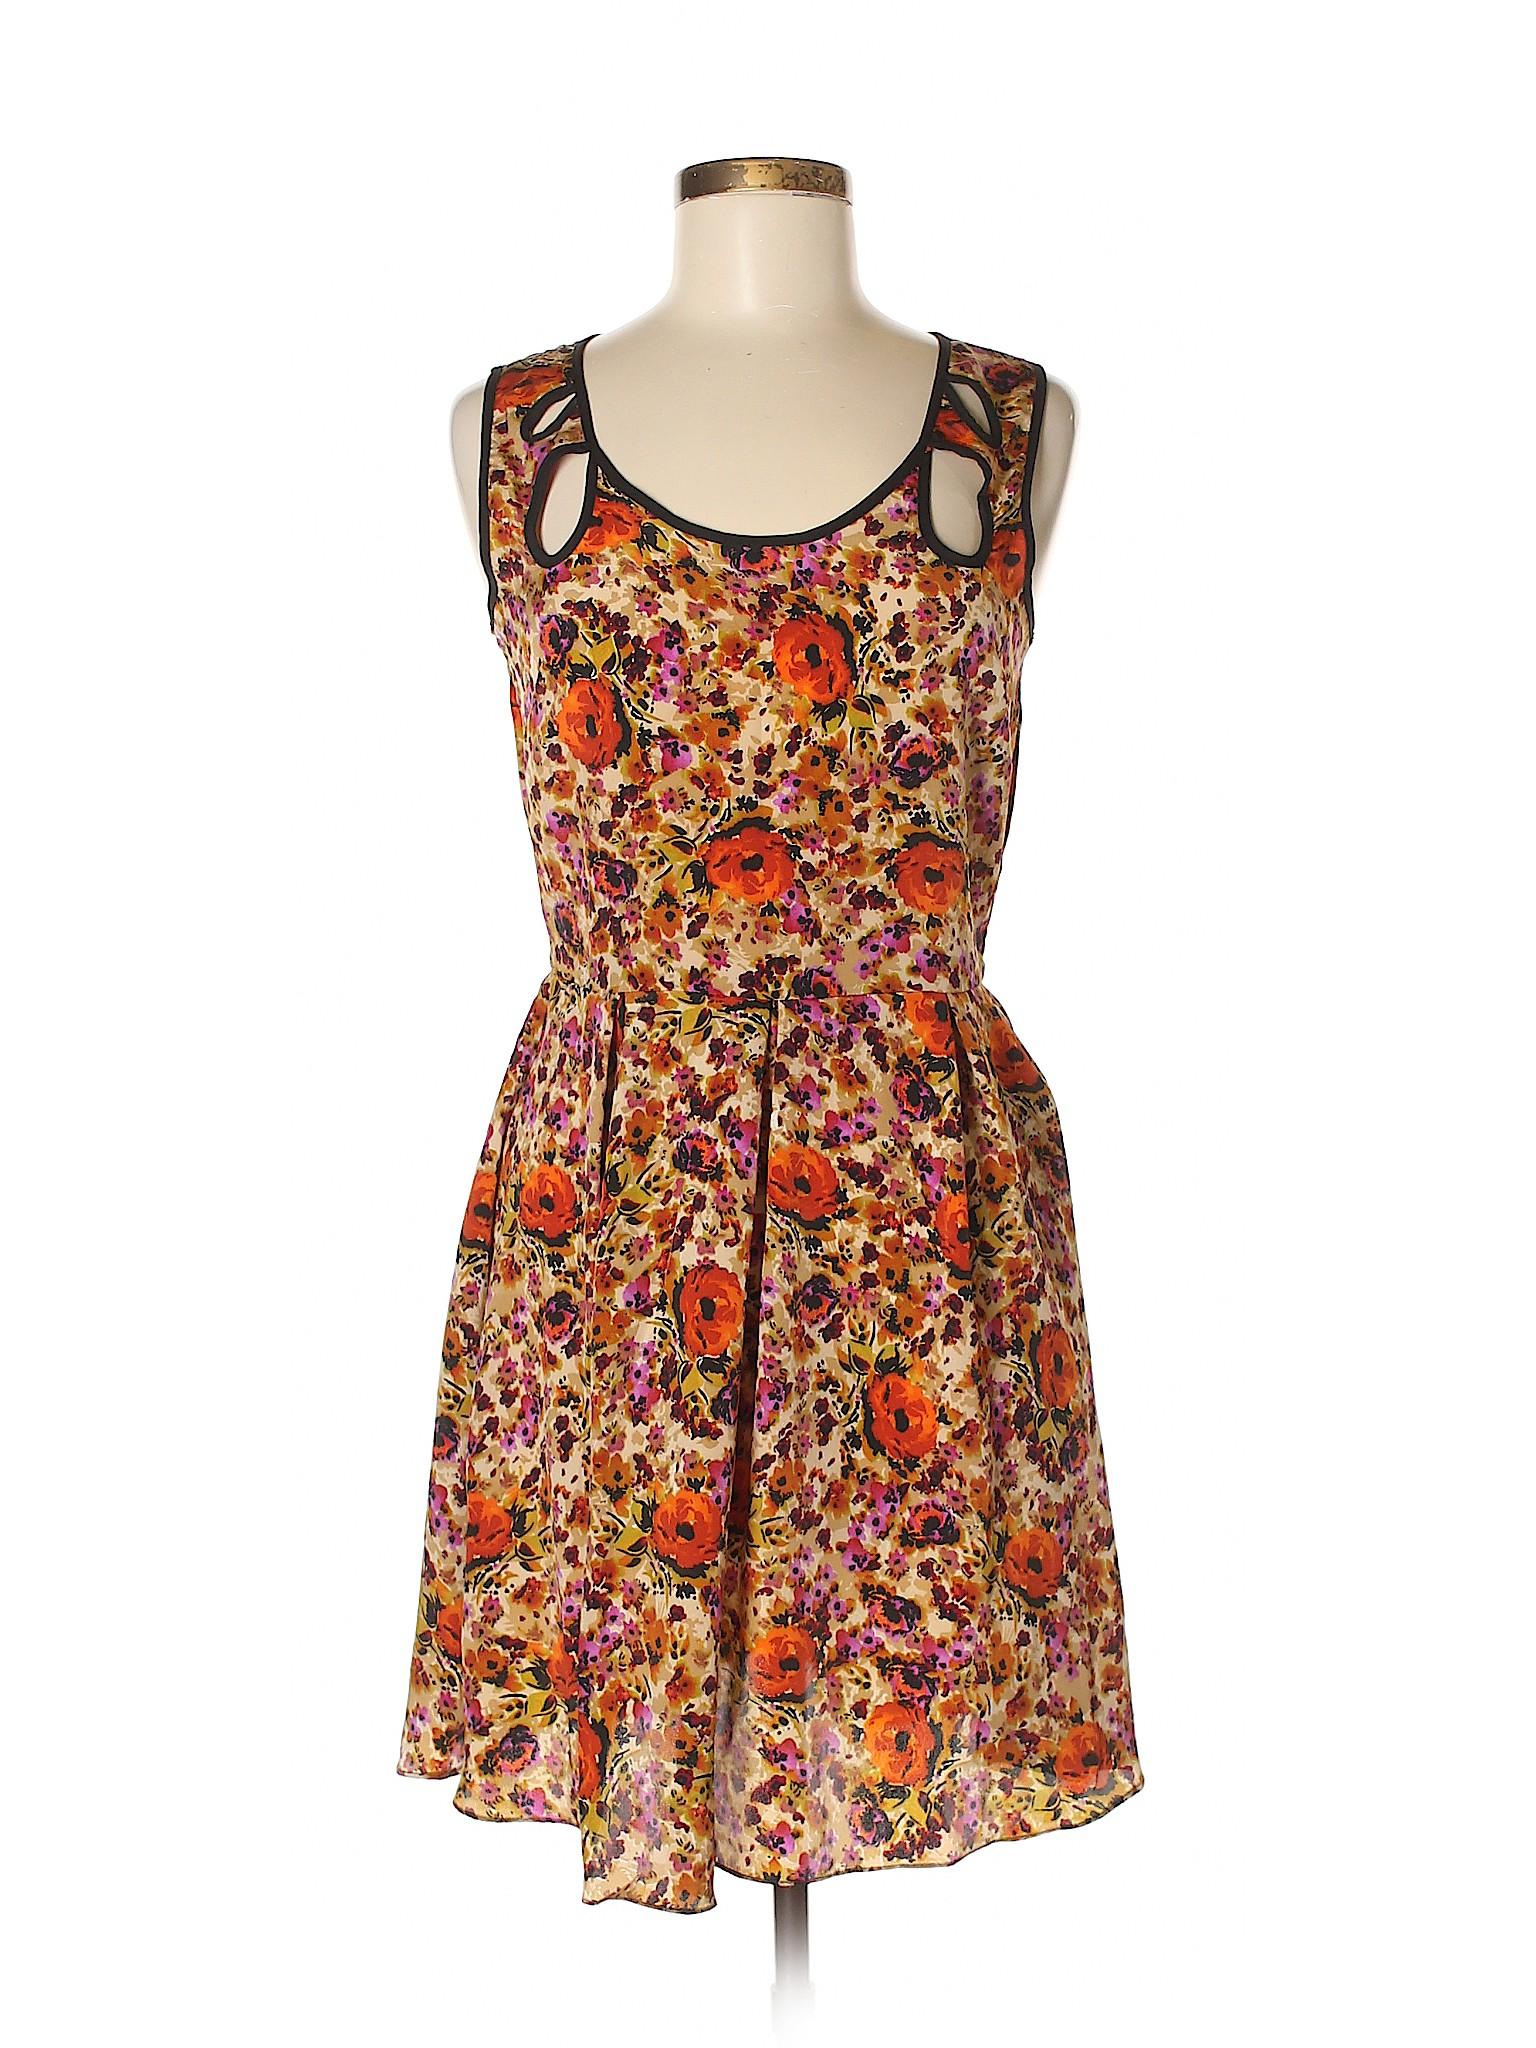 Boutique Boutique Casual Angie Dress winter winter 6B0daBq